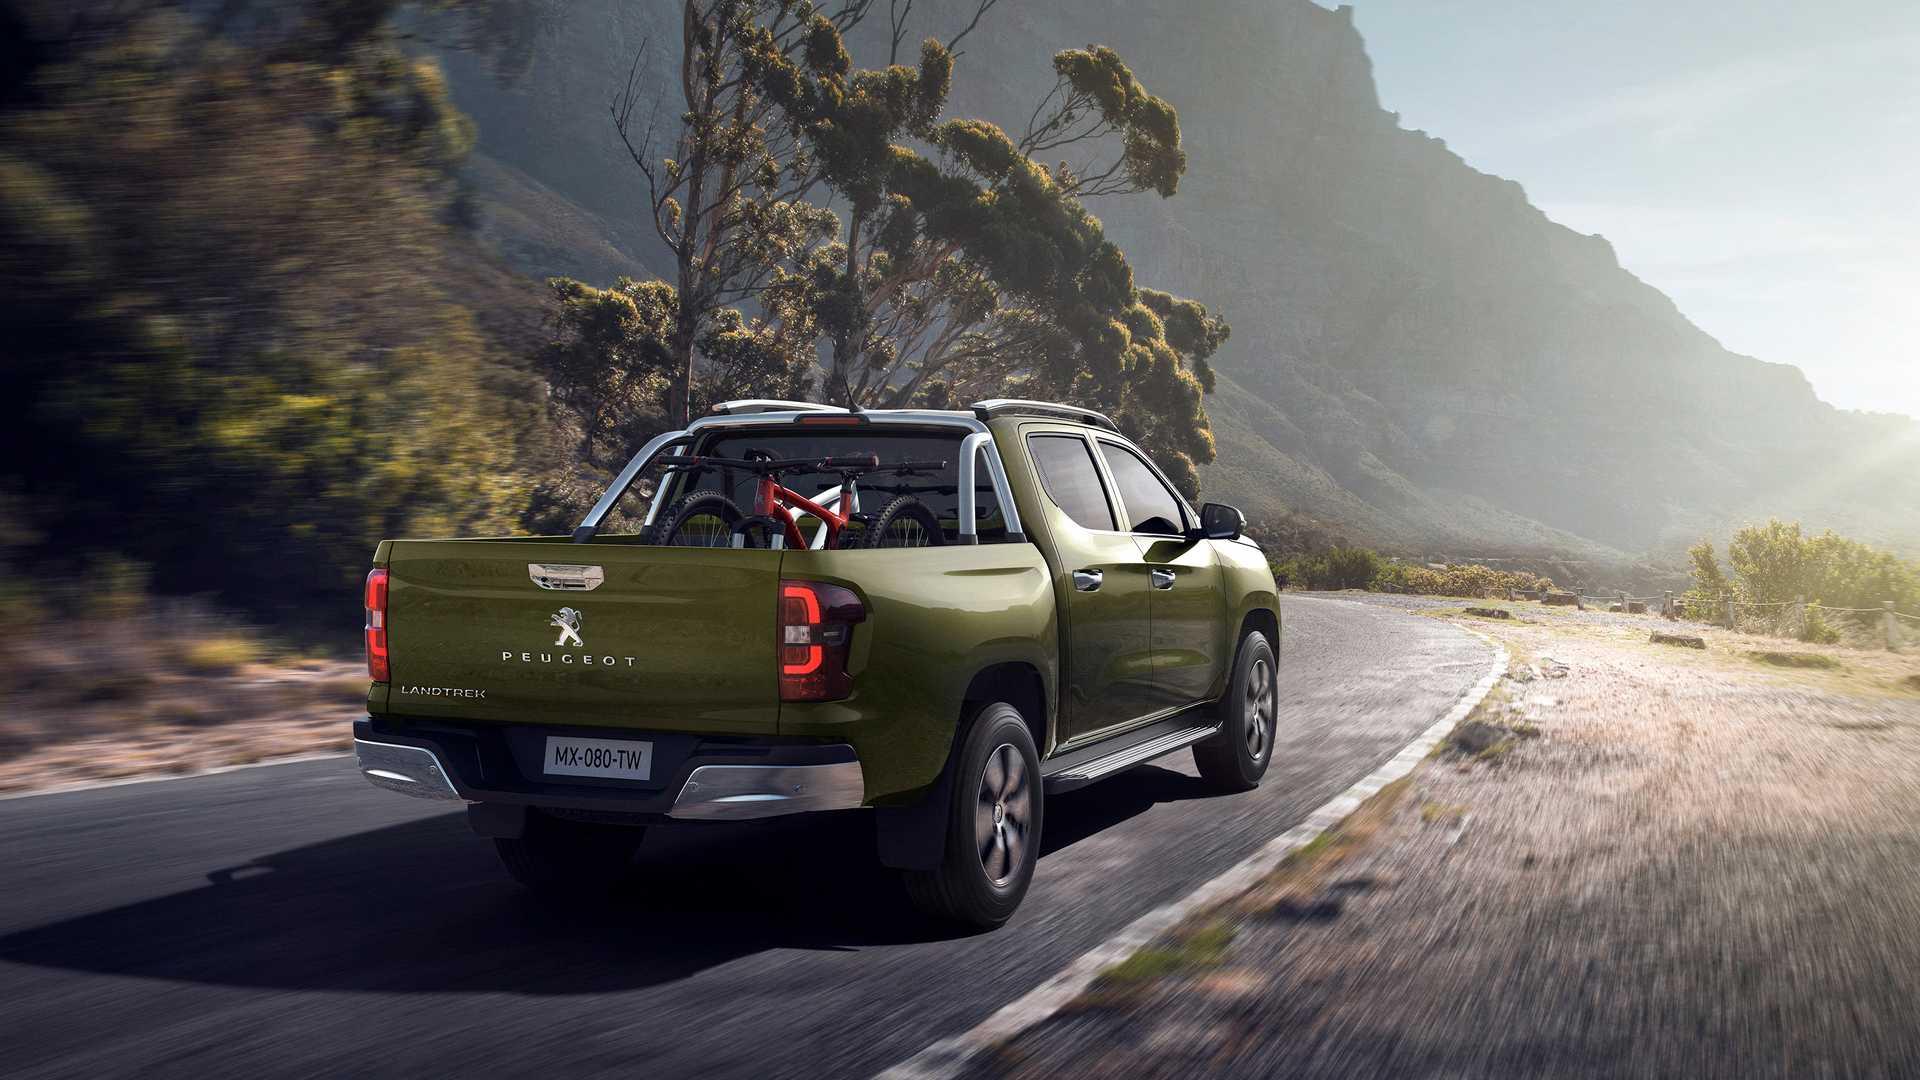 2021 Peugeot Landtrek Rear Three-Quarter Wallpapers (4)